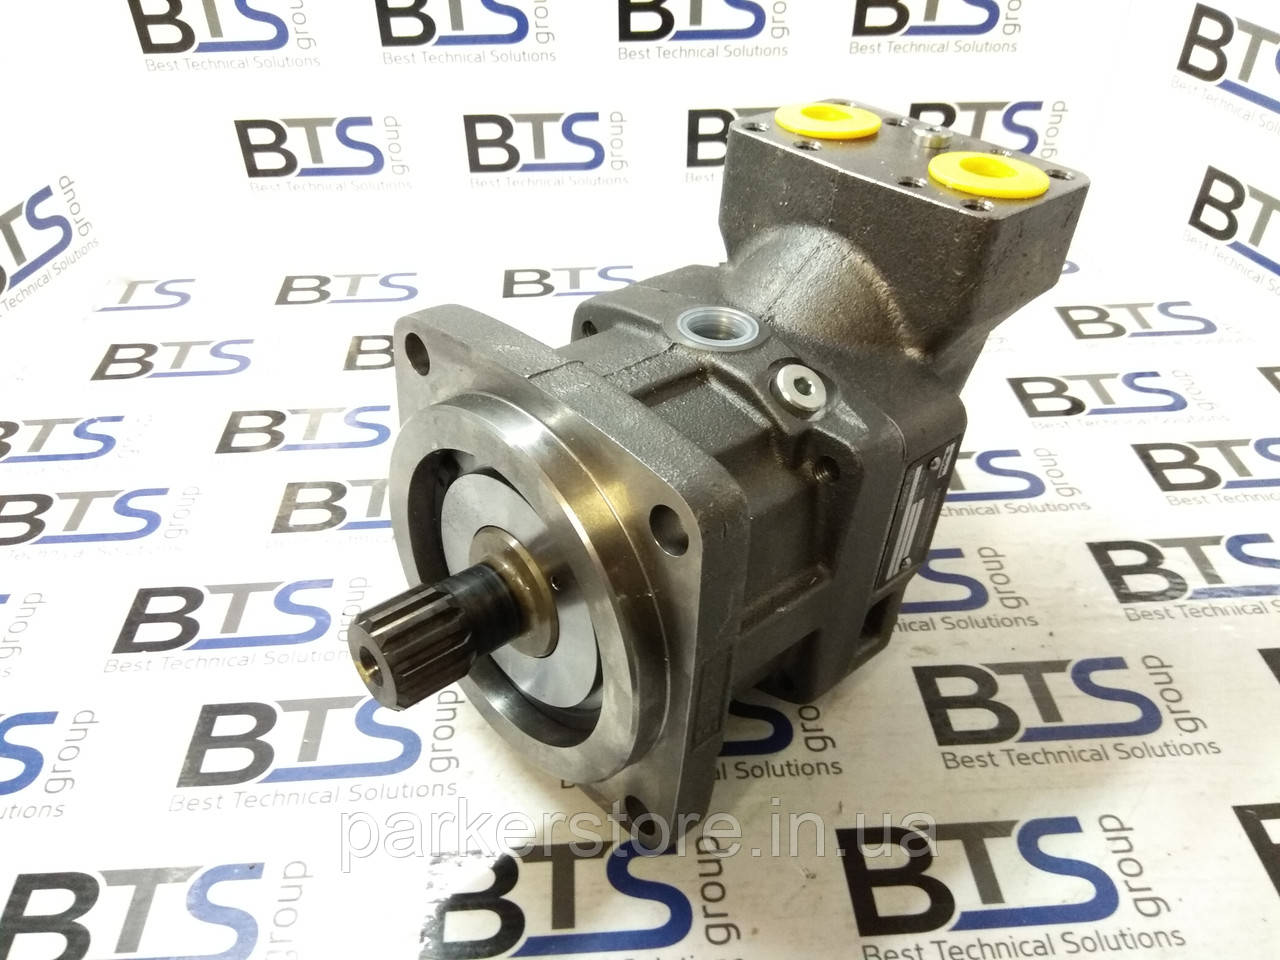 Гидромотор Parker 3799520 F12-040-MF-CV-C-000-0000-00